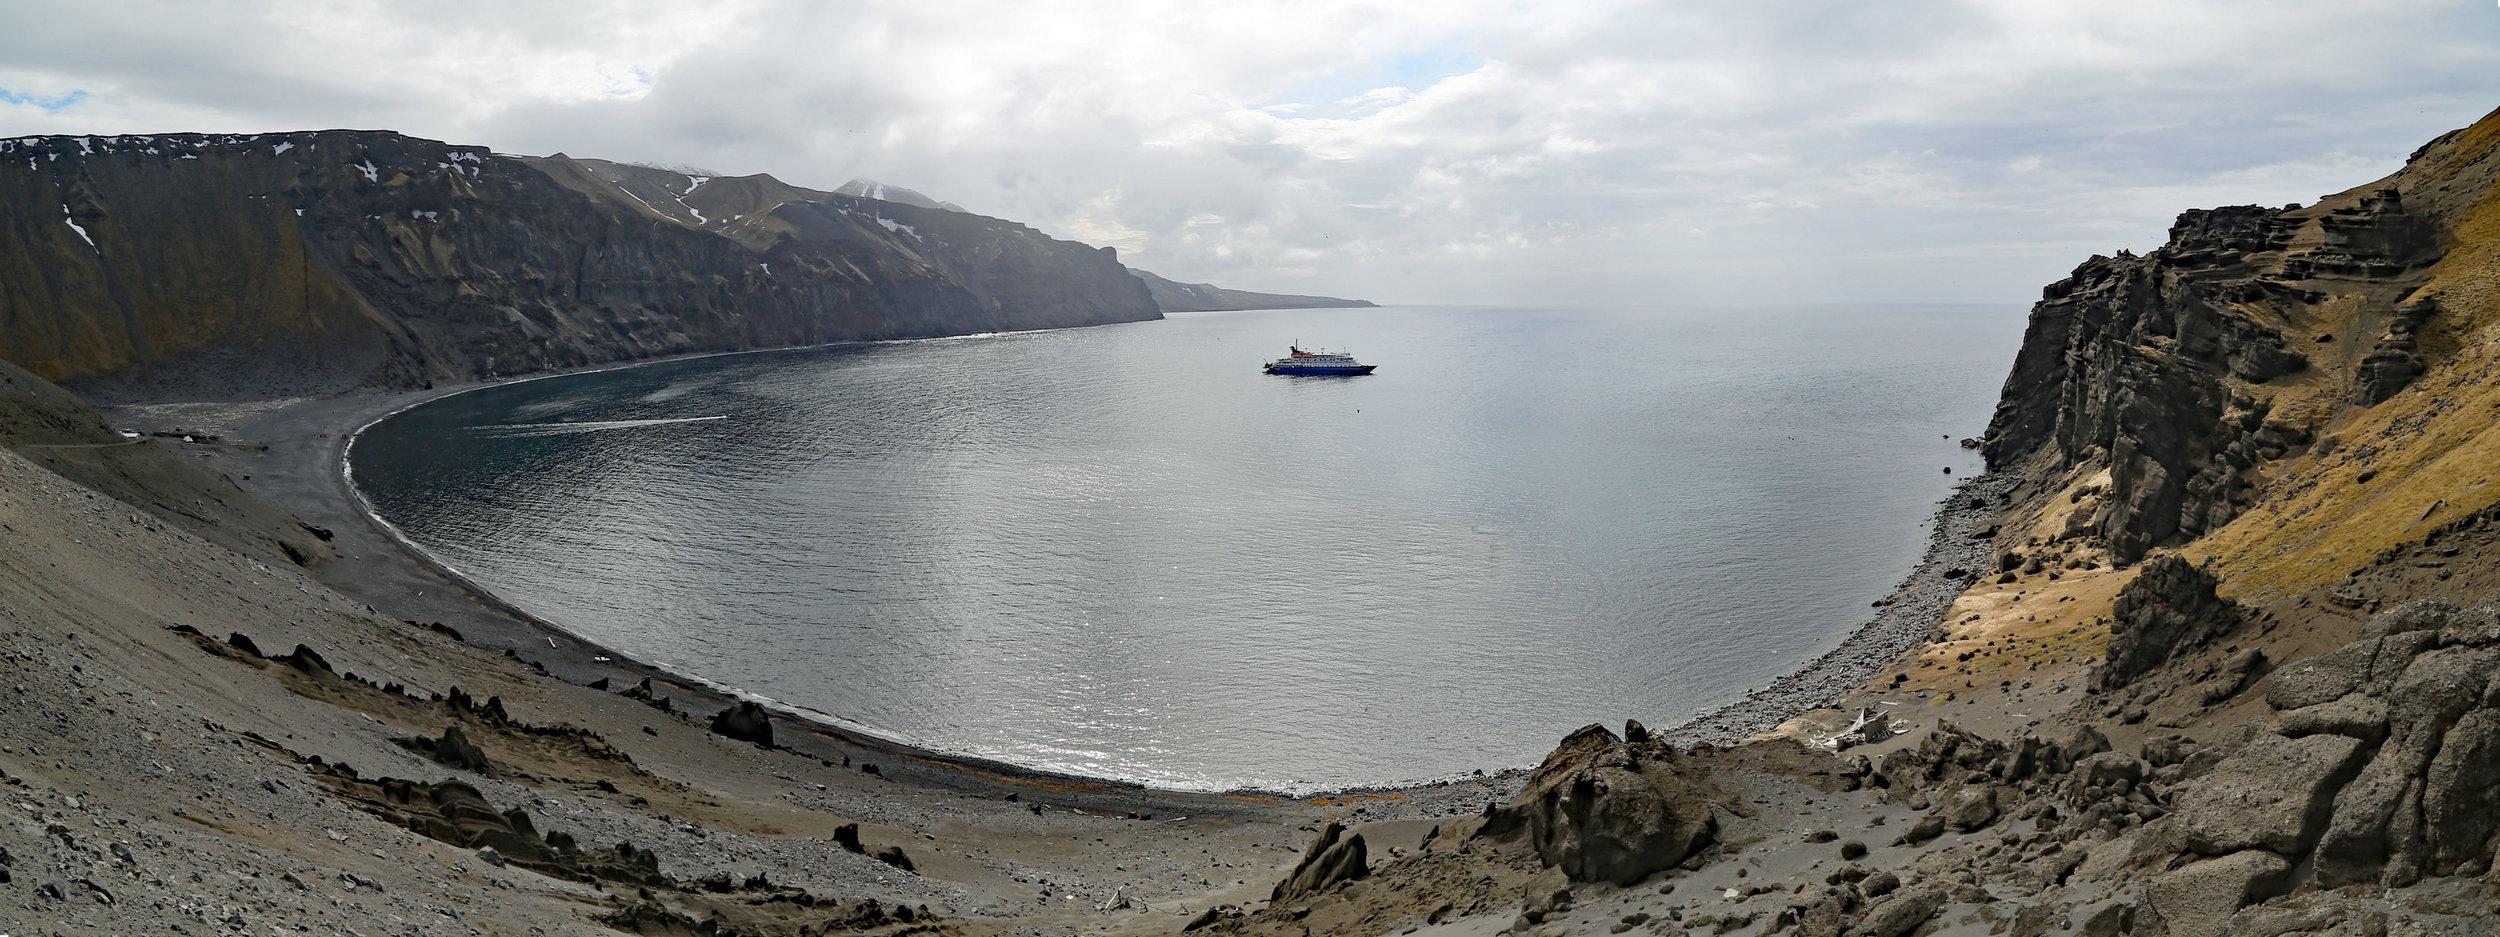 M/V Sea Spirit  at anchor.